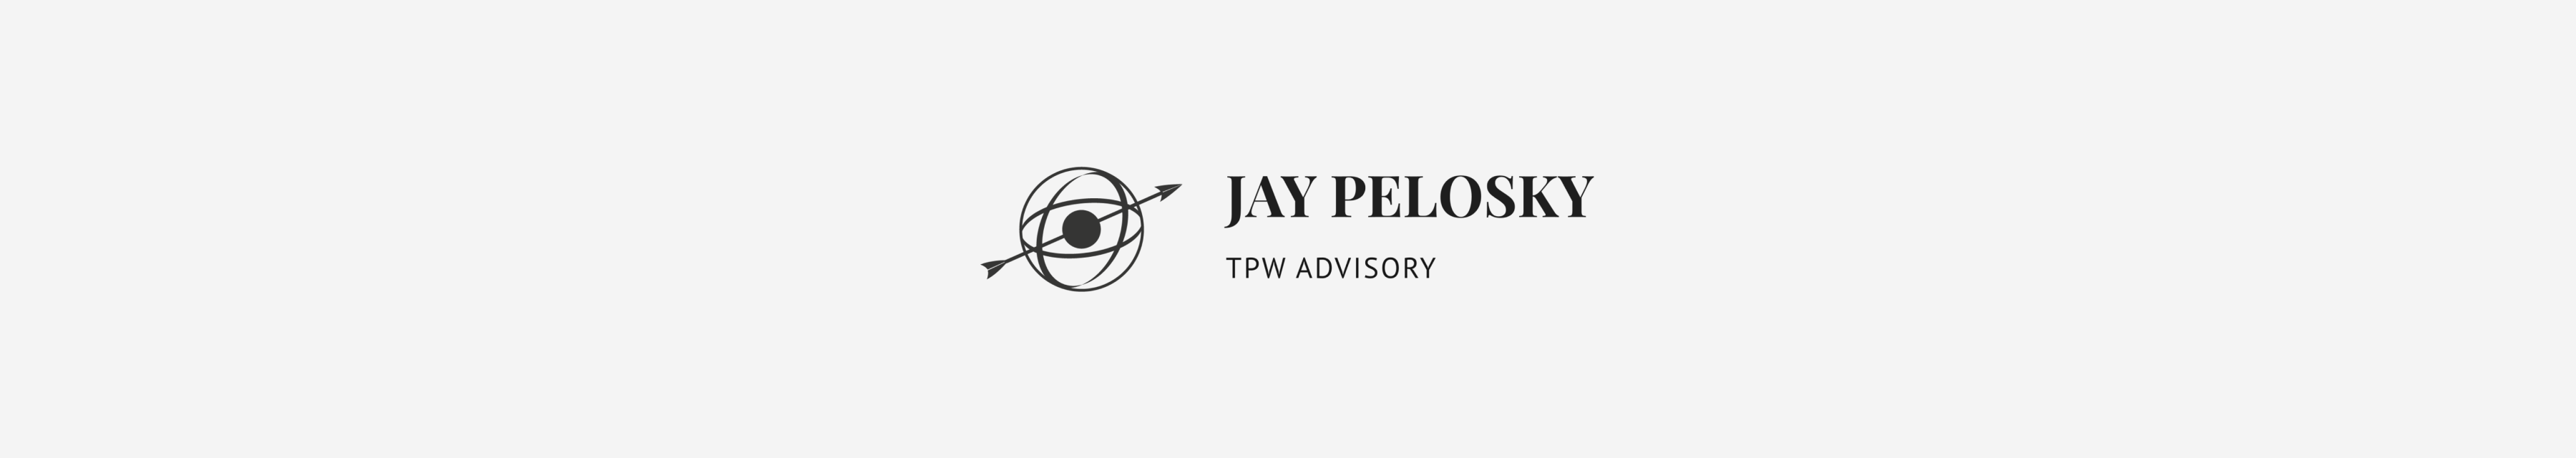 TPW Advisory